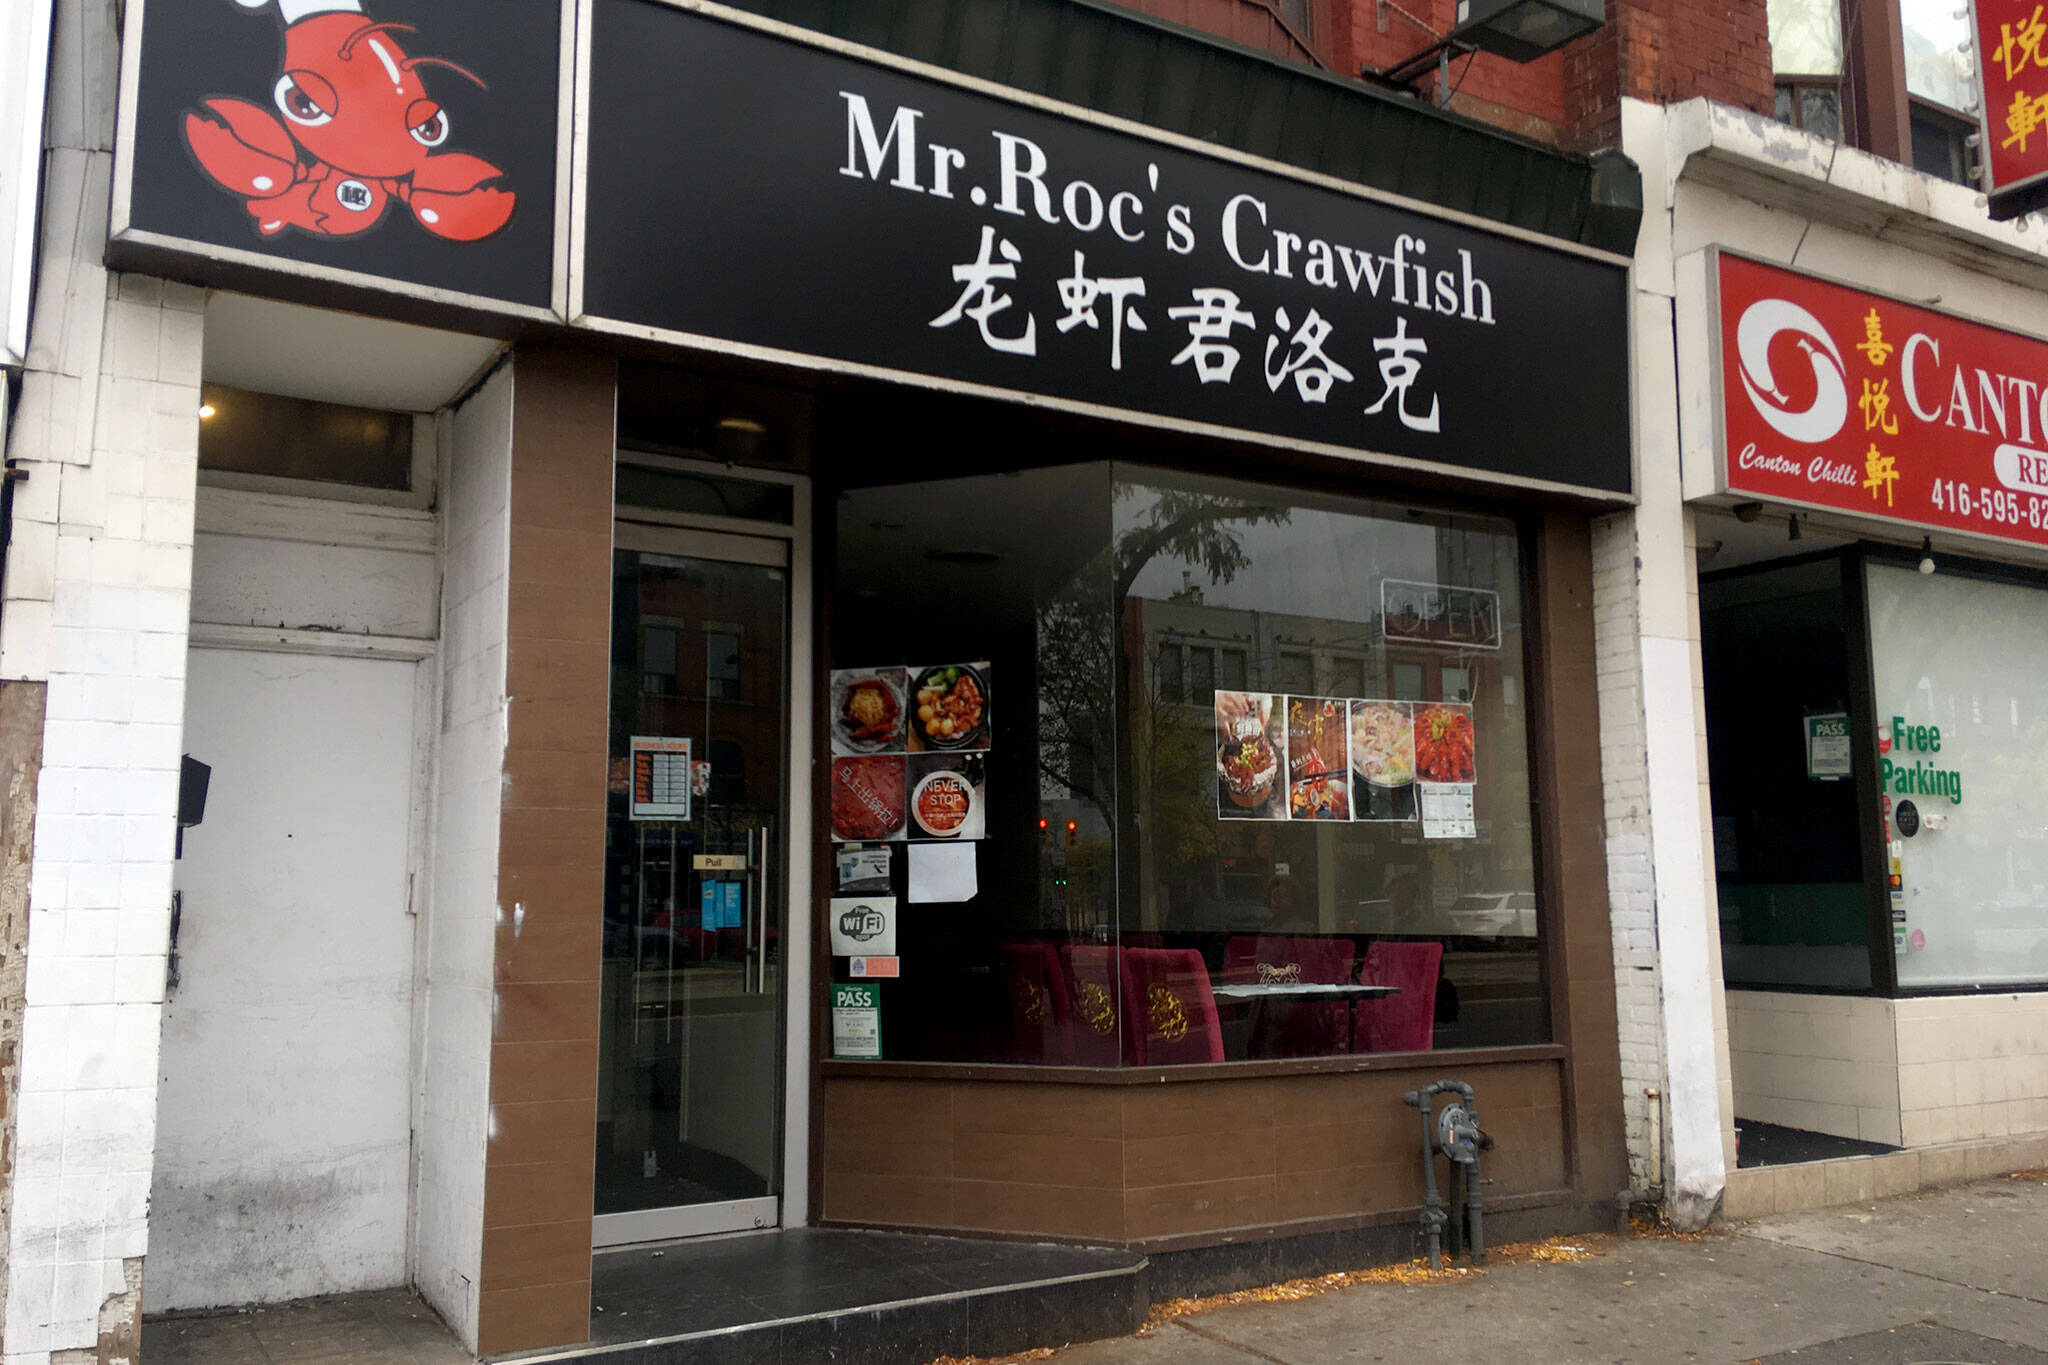 mr.rocs,mr,rocs,crawfish,toronto,seafood